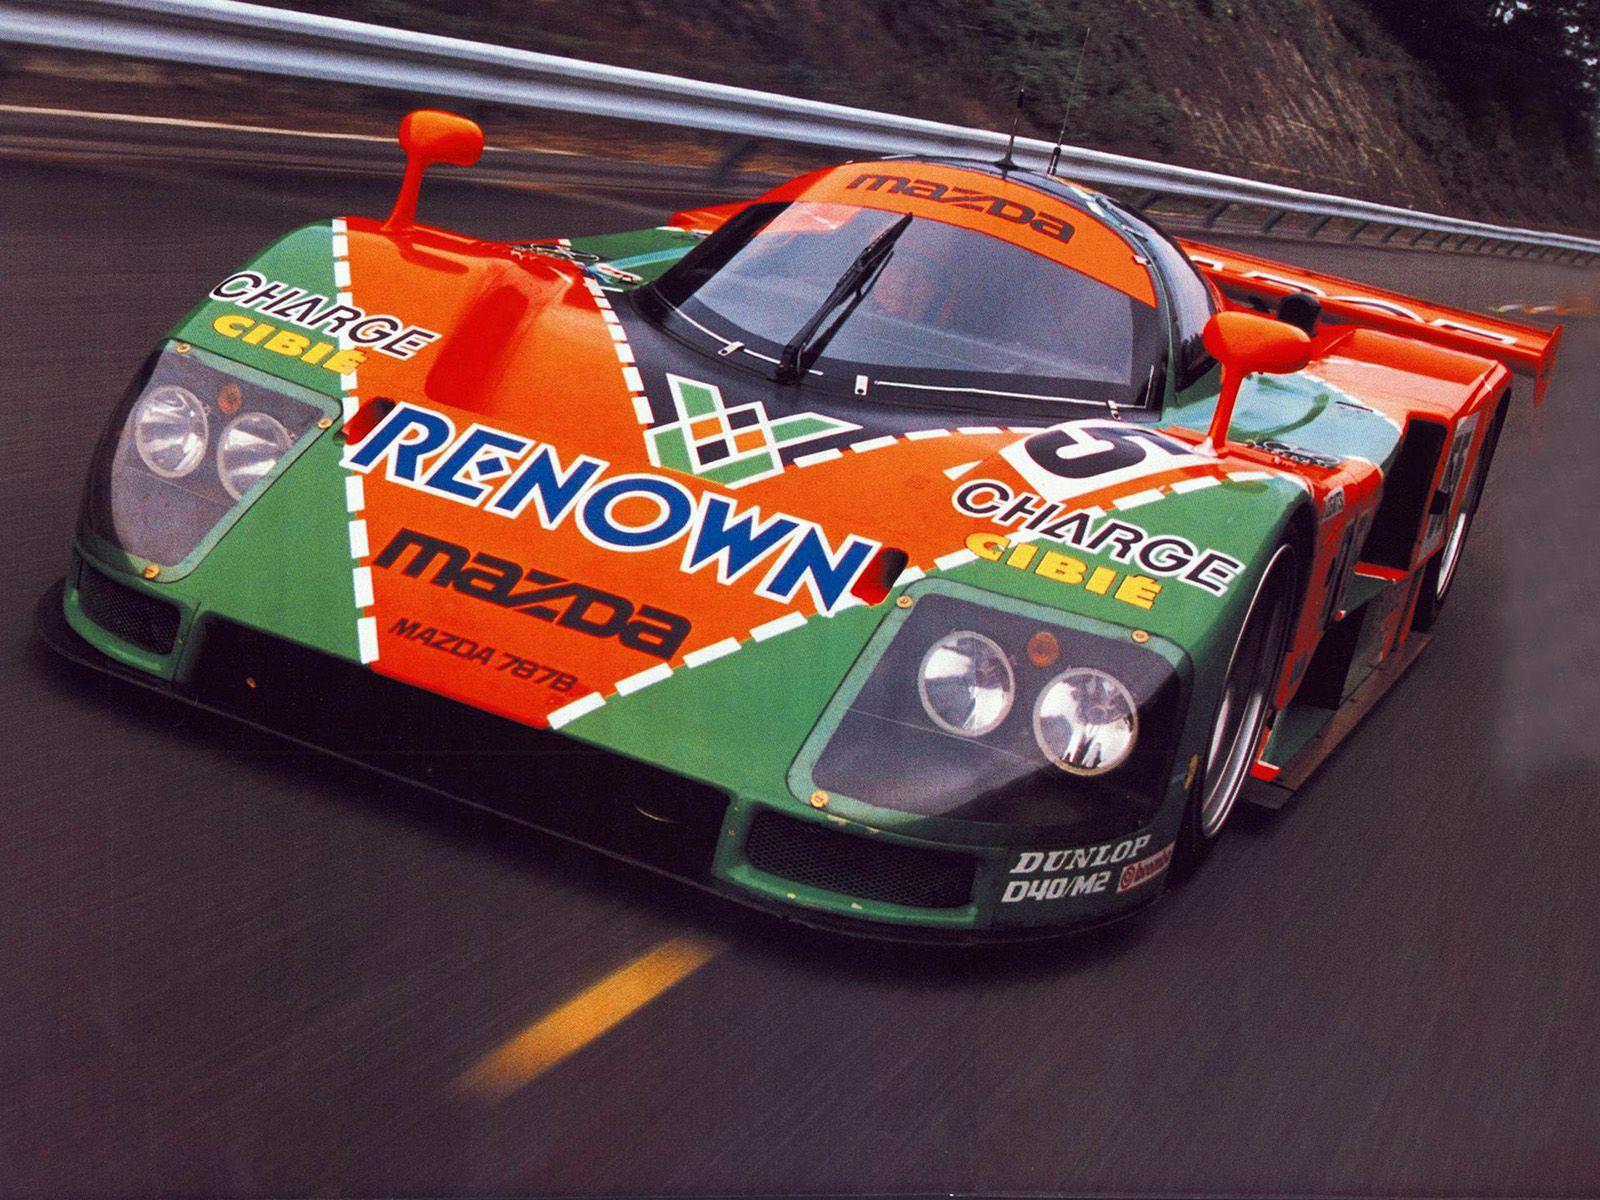 1991 Mazda 787b Le Mans Winner More